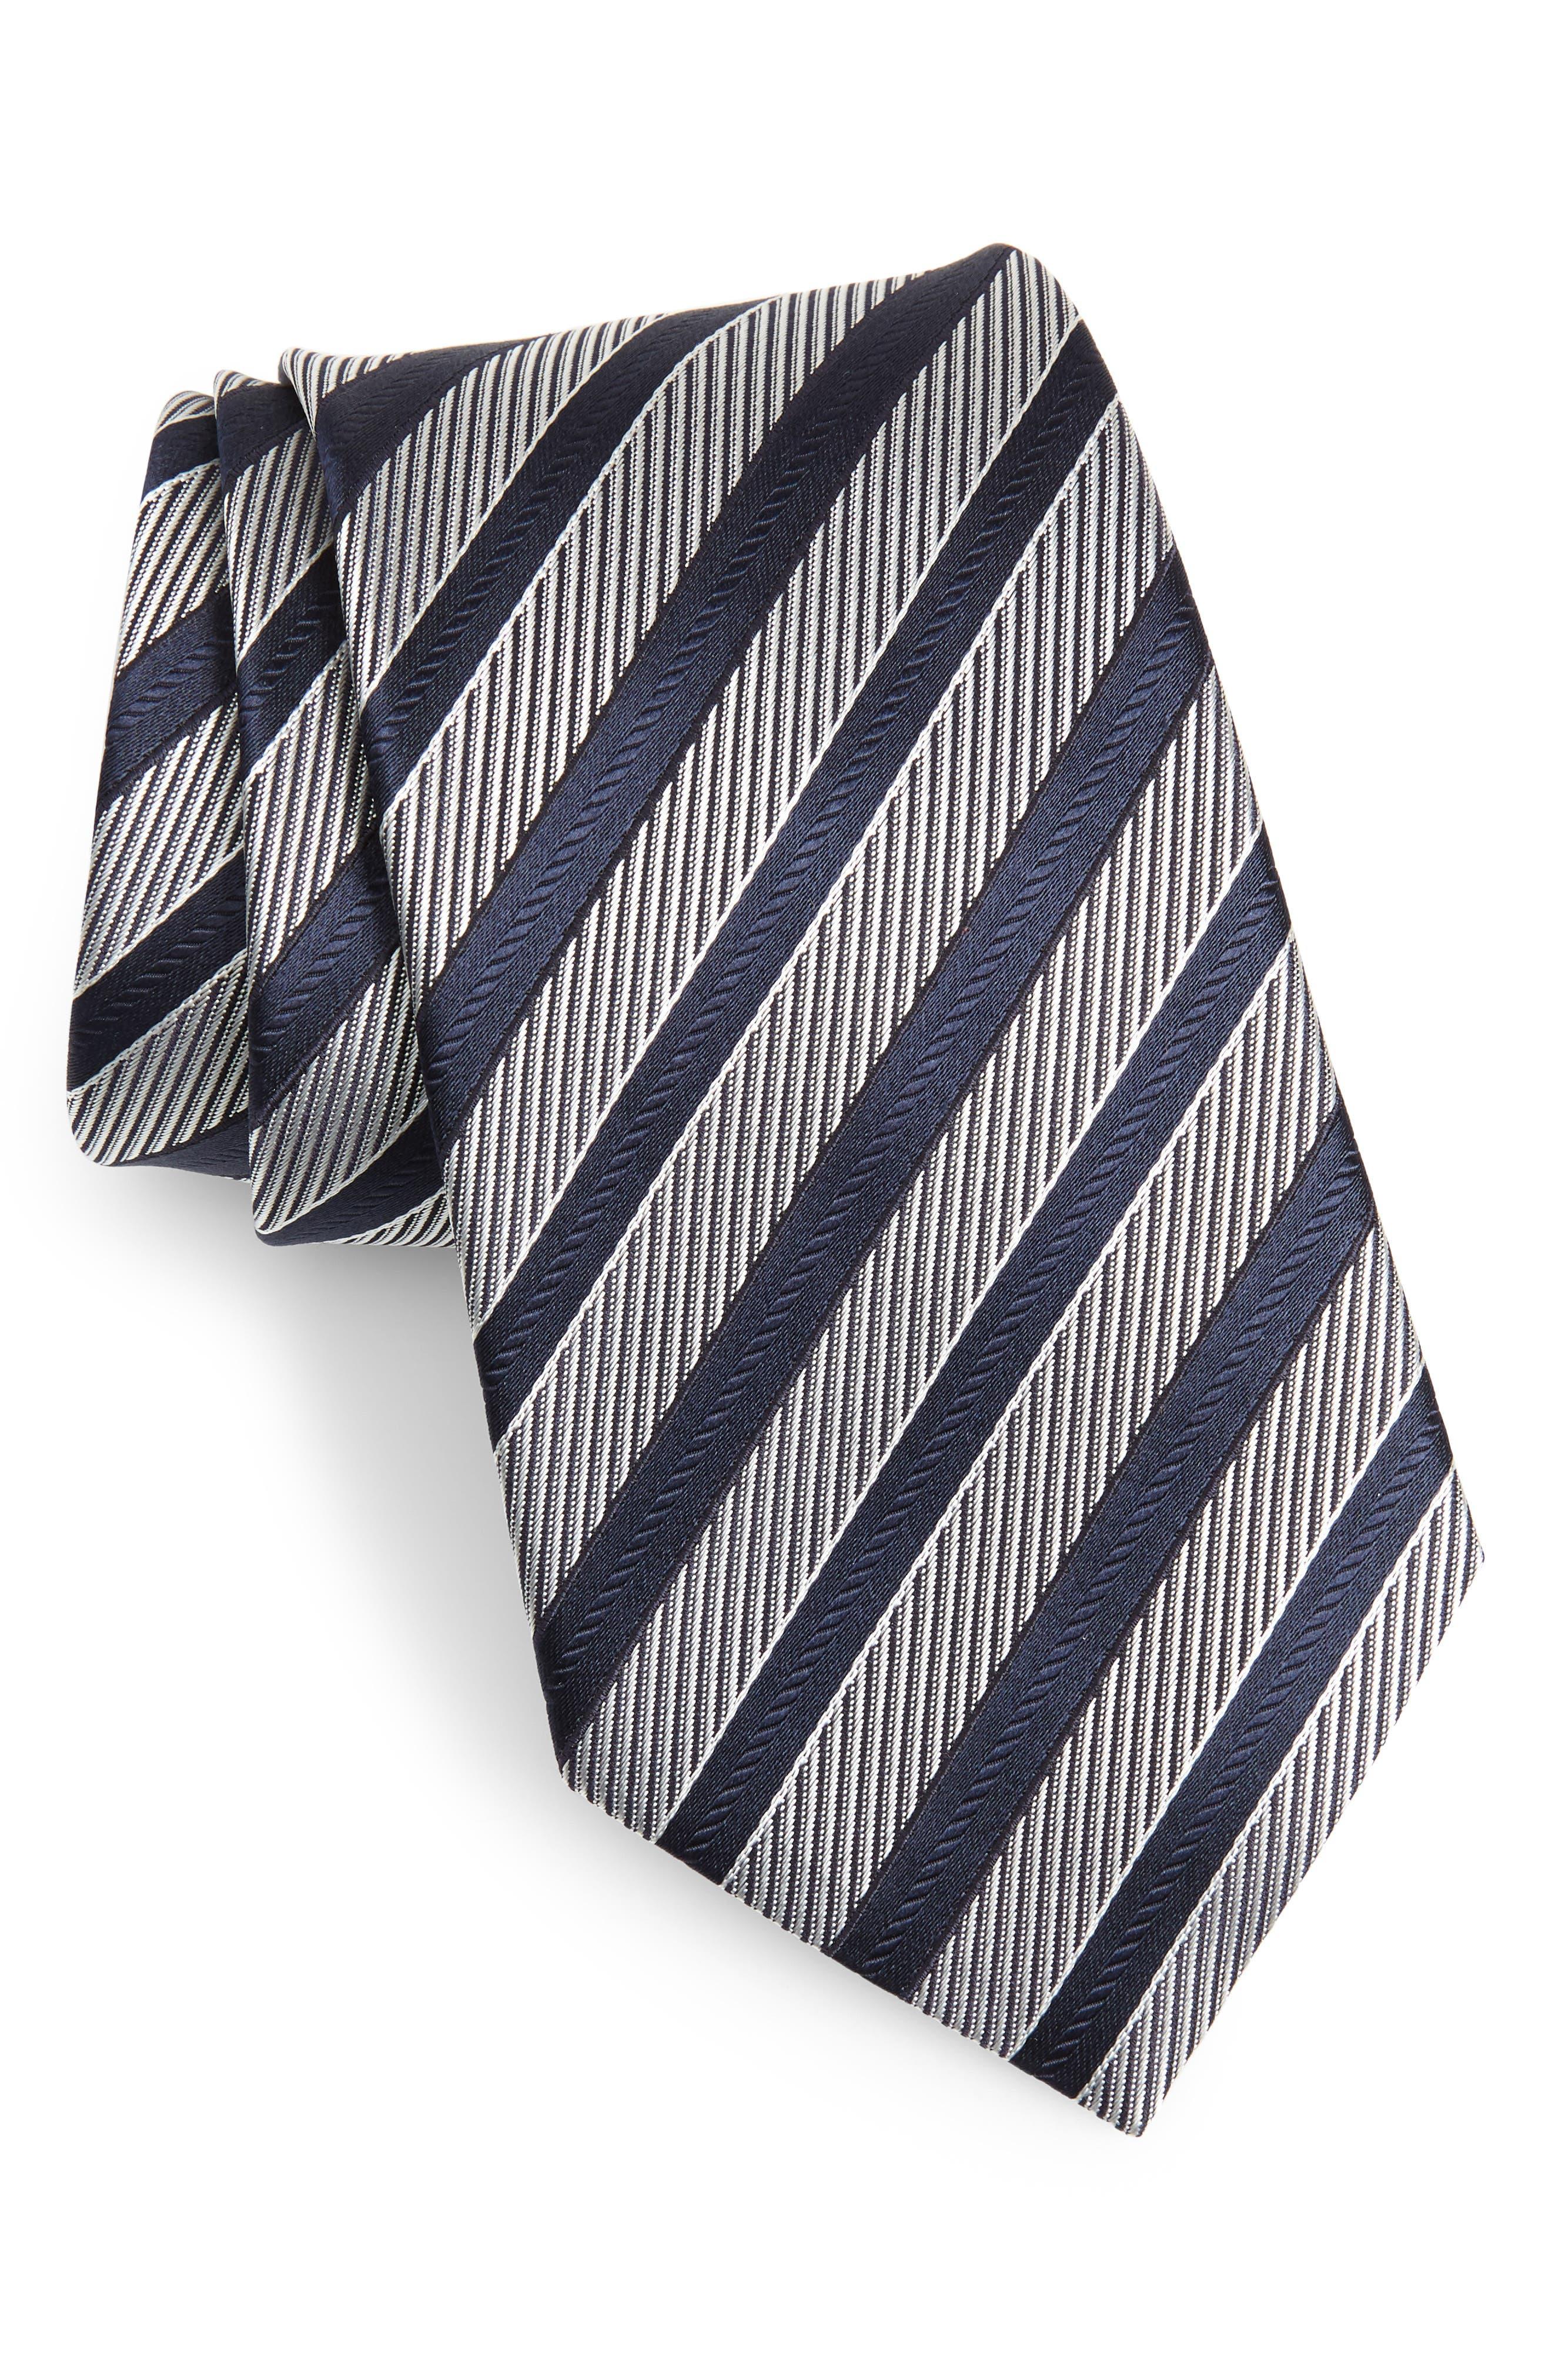 ERMENEGILDO ZEGNA Stripe Silk Tie, Main, color, NAVY/ SILVER